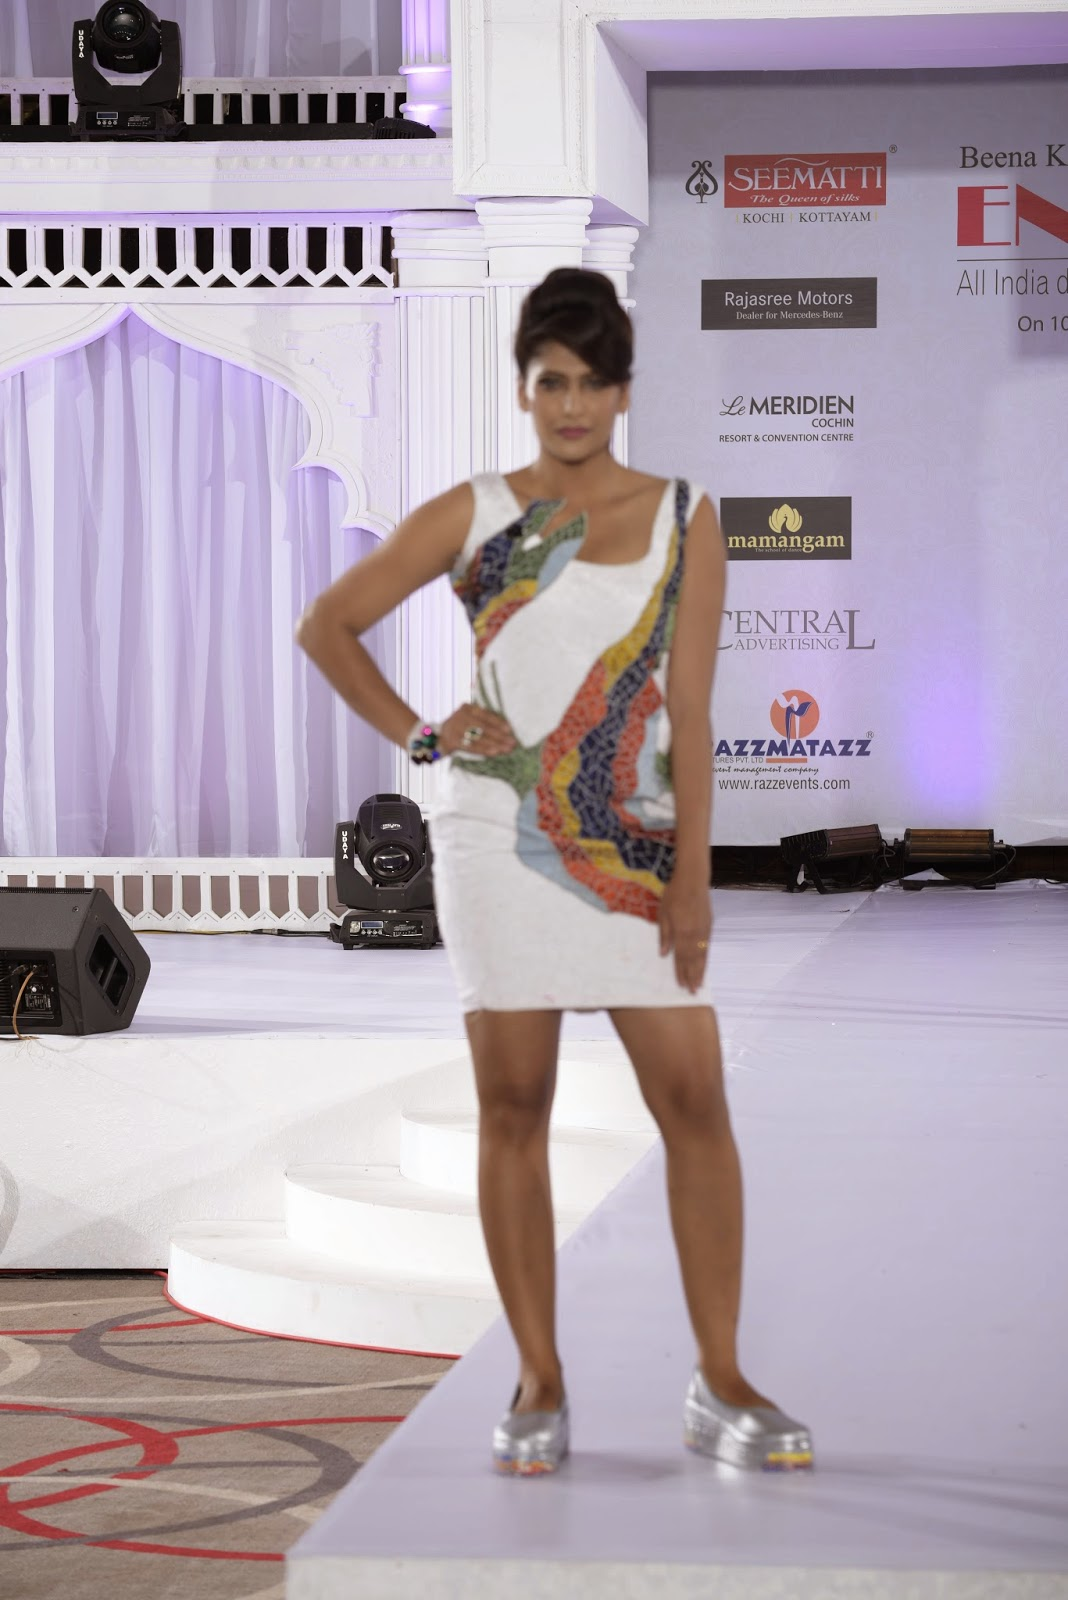 Seematti Ensemble 2014 A3 International Institute Of Fashion Design Chennai Team 2